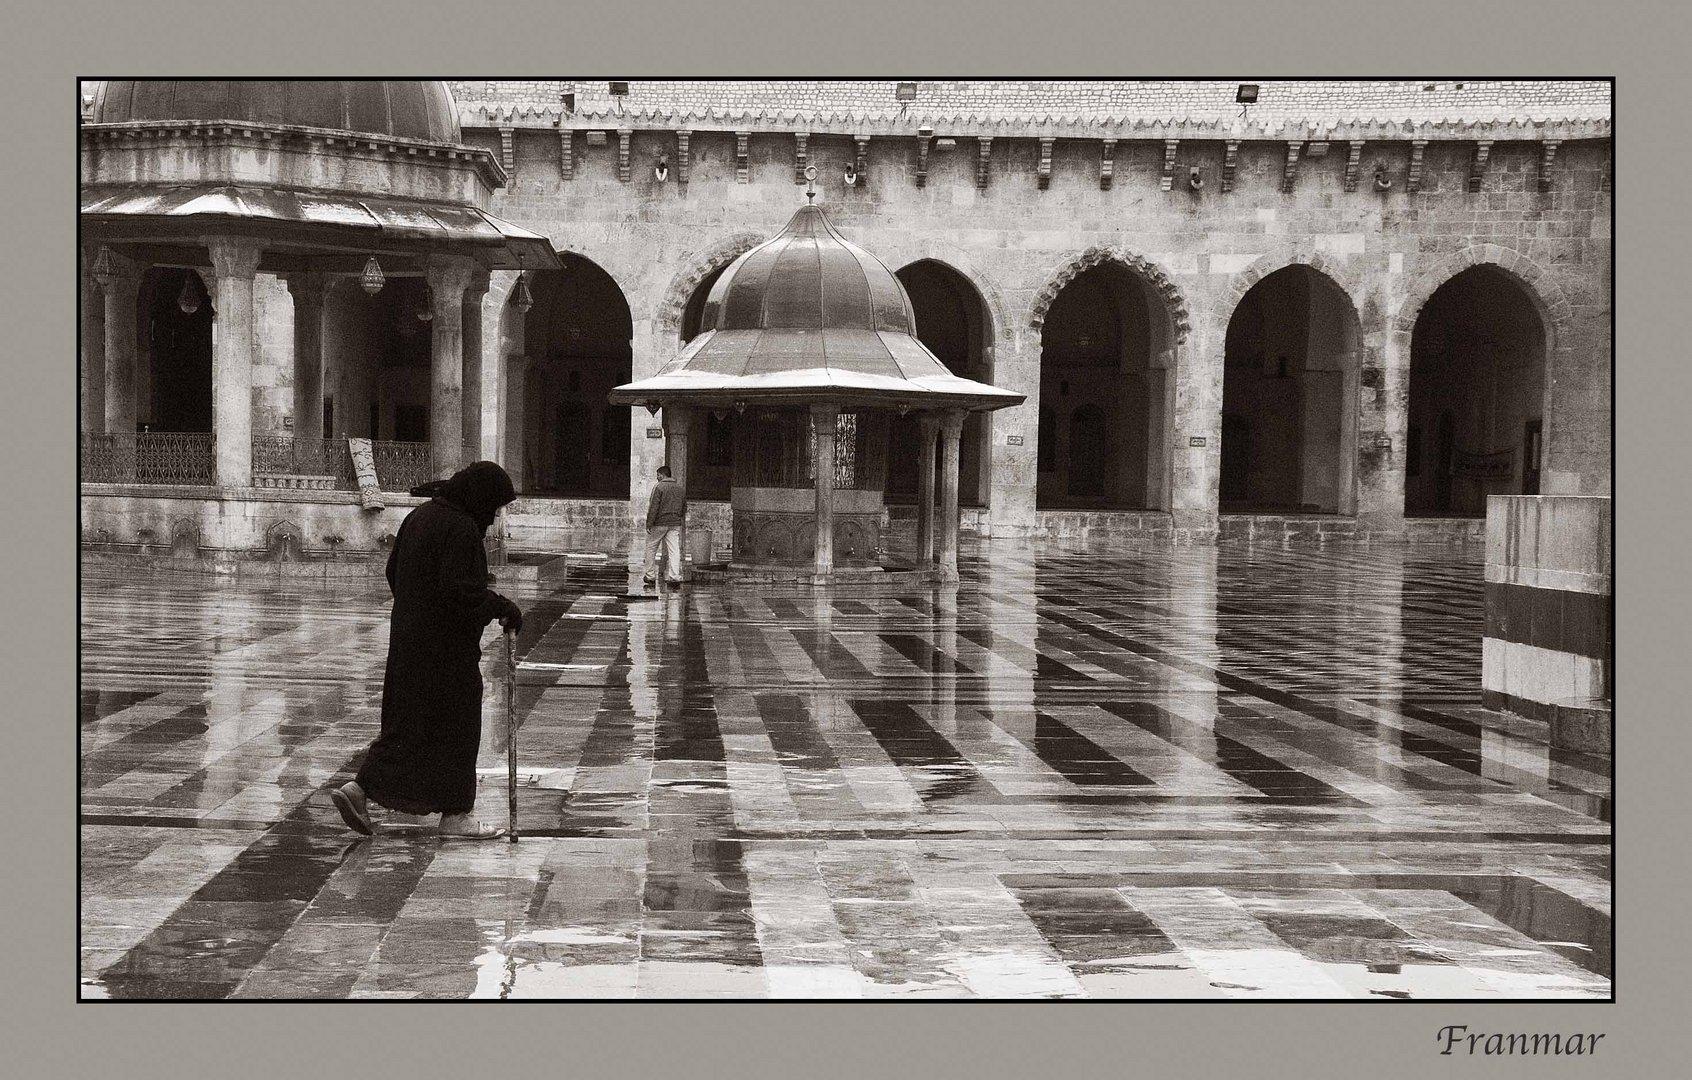 Llueve sobre Alepo